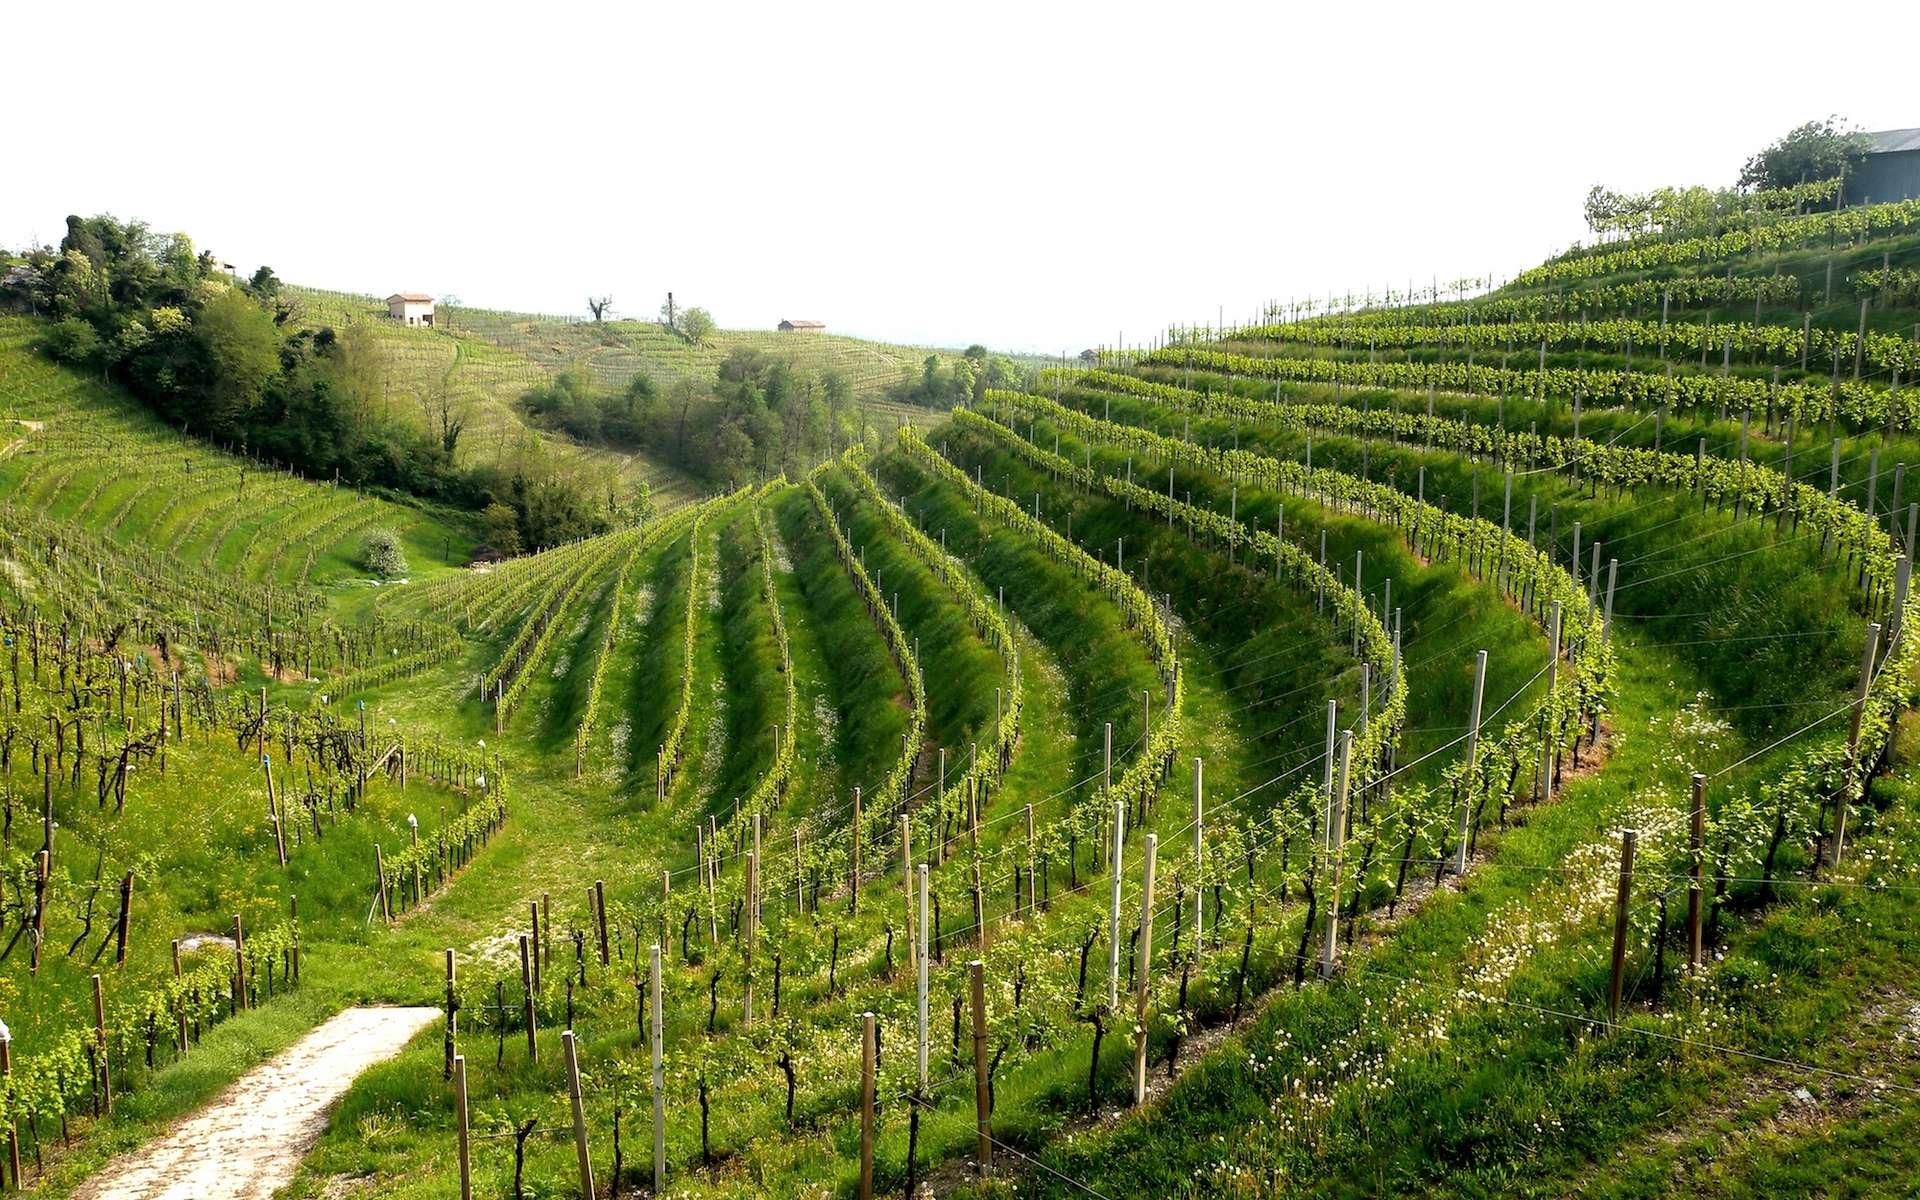 Les vignobles du prosecco entraînent une dégradation des sols alarmante en Italie. © Saverio Sartori, Flickr.jpg